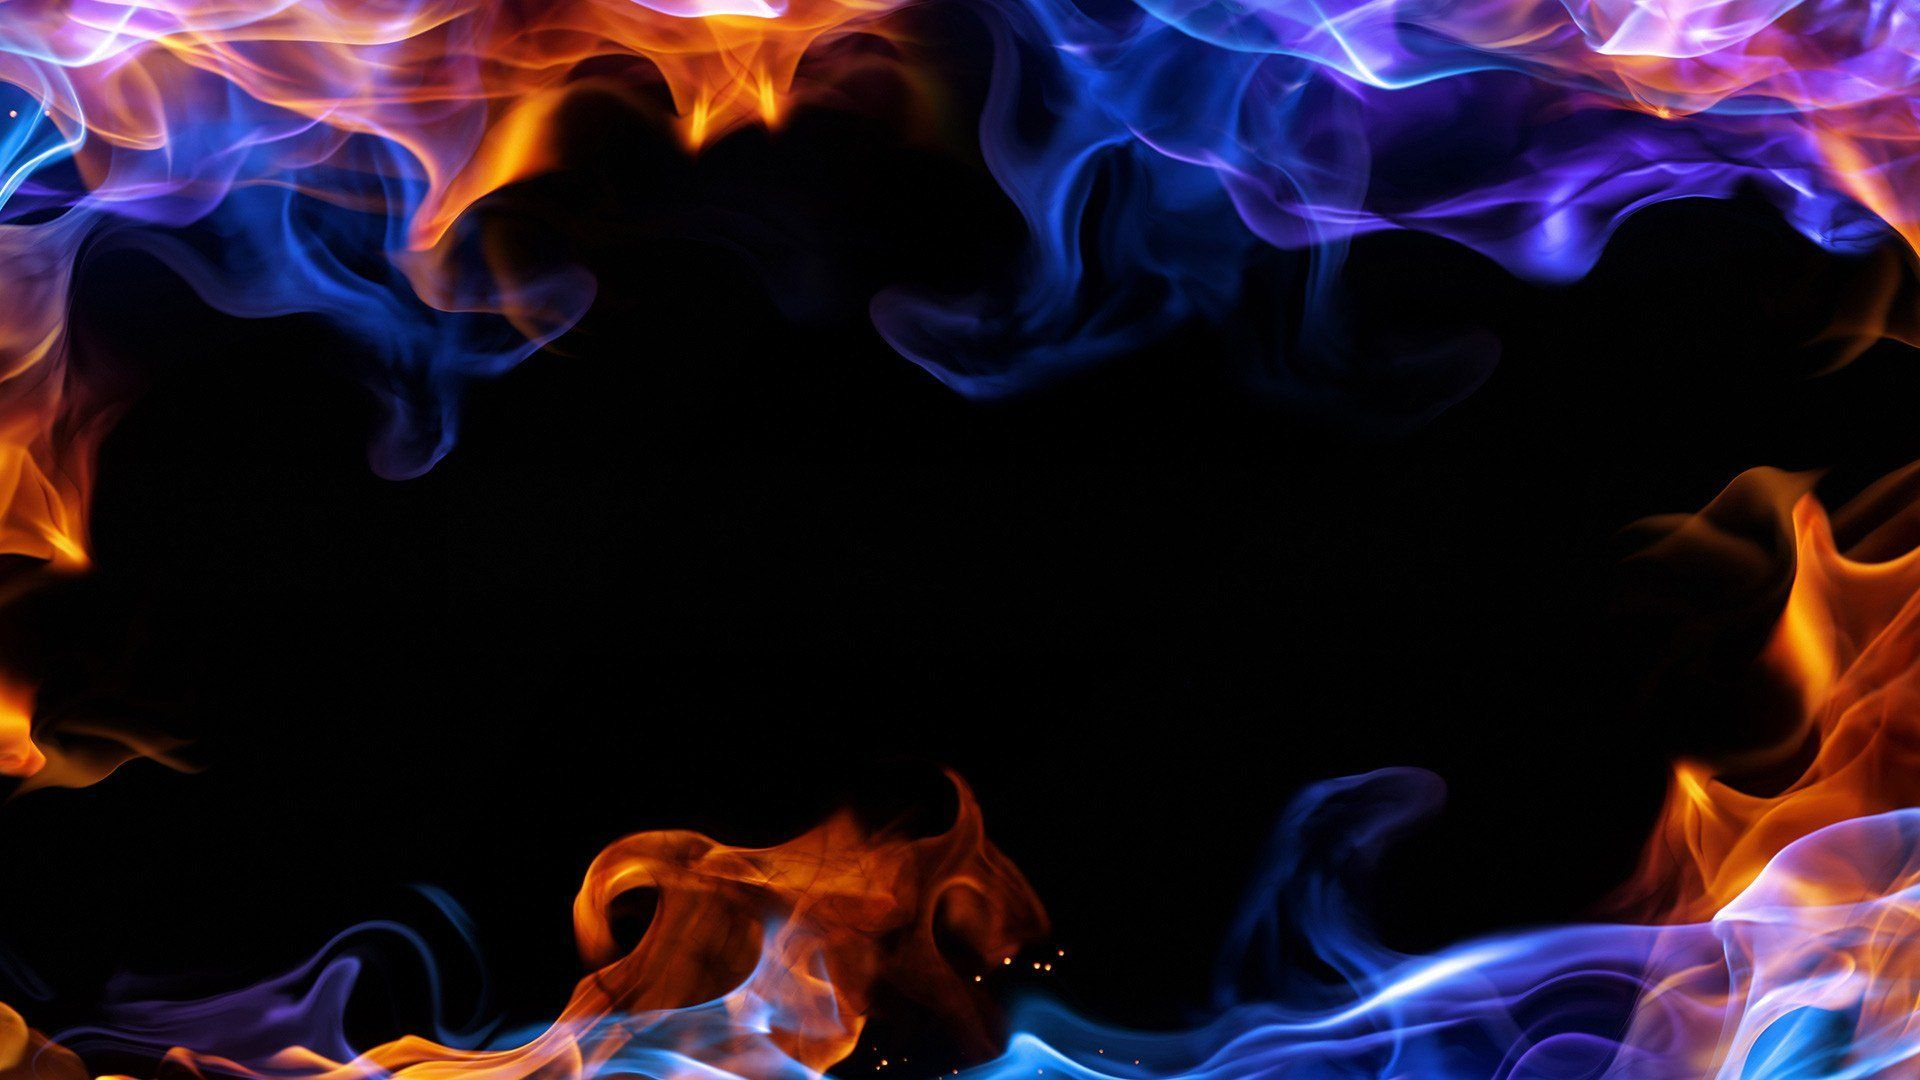 flames hd wallpapers top